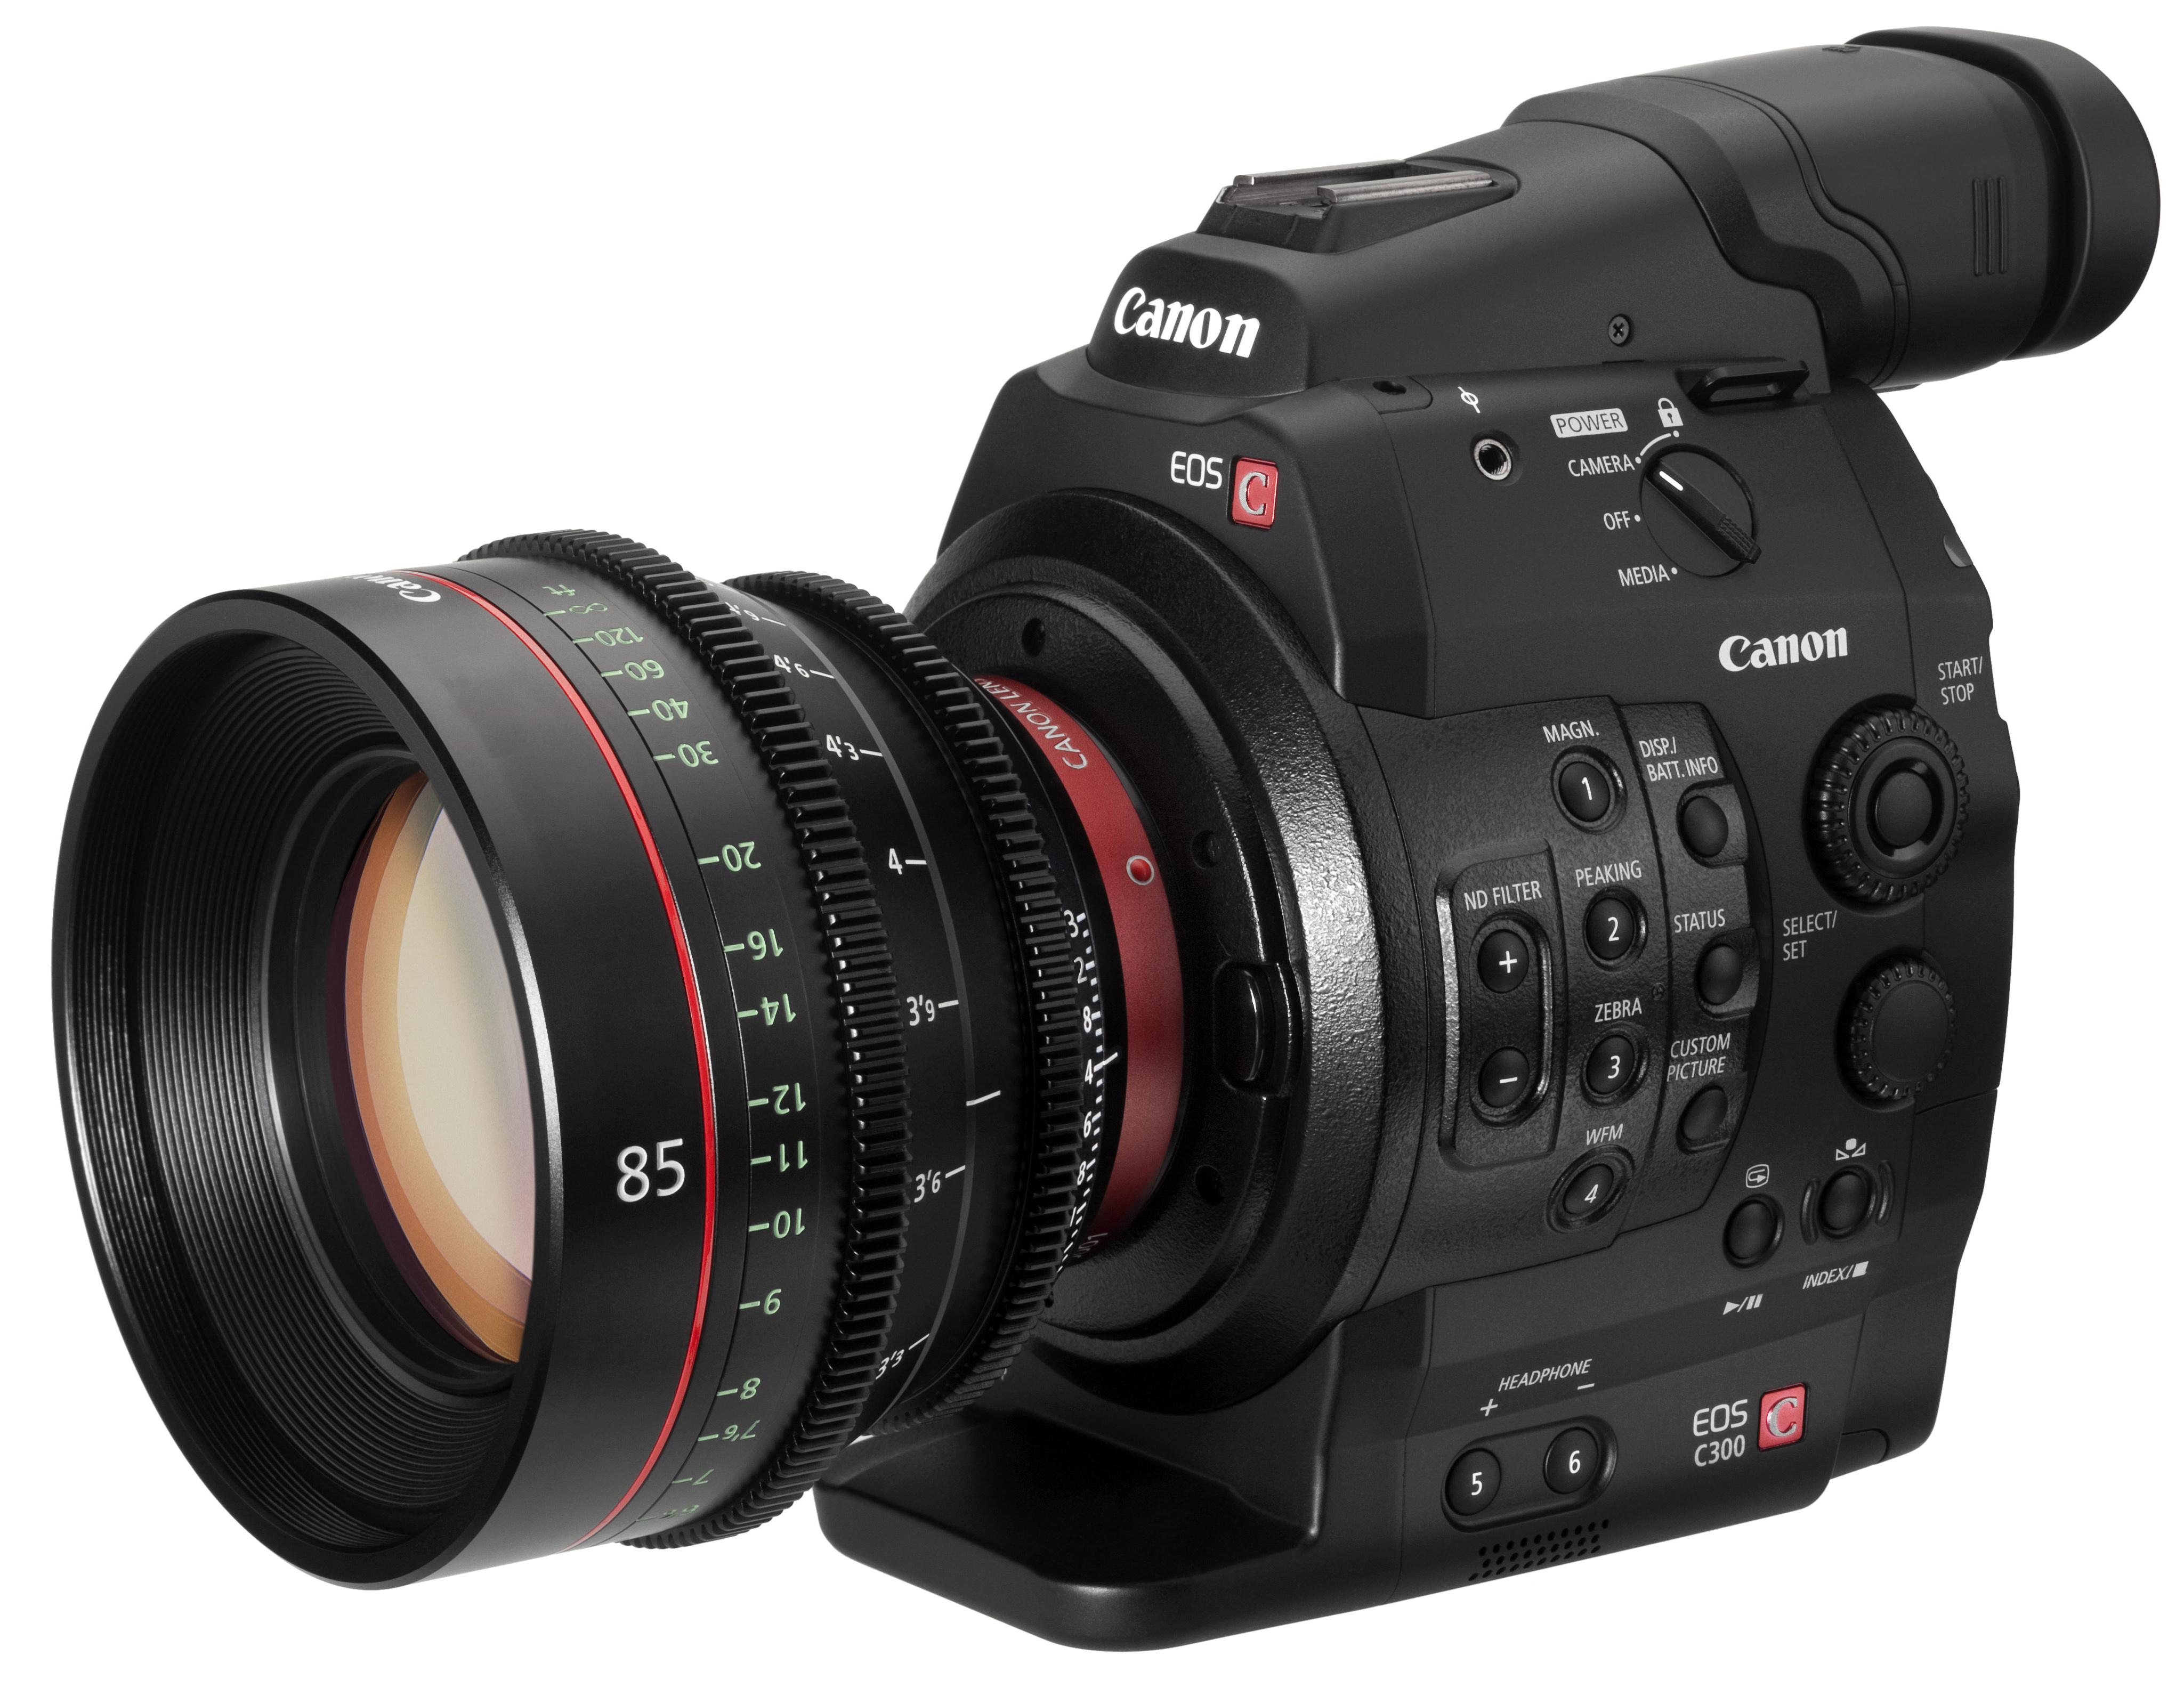 Canon EOS C300 Video Digital SLR Announced